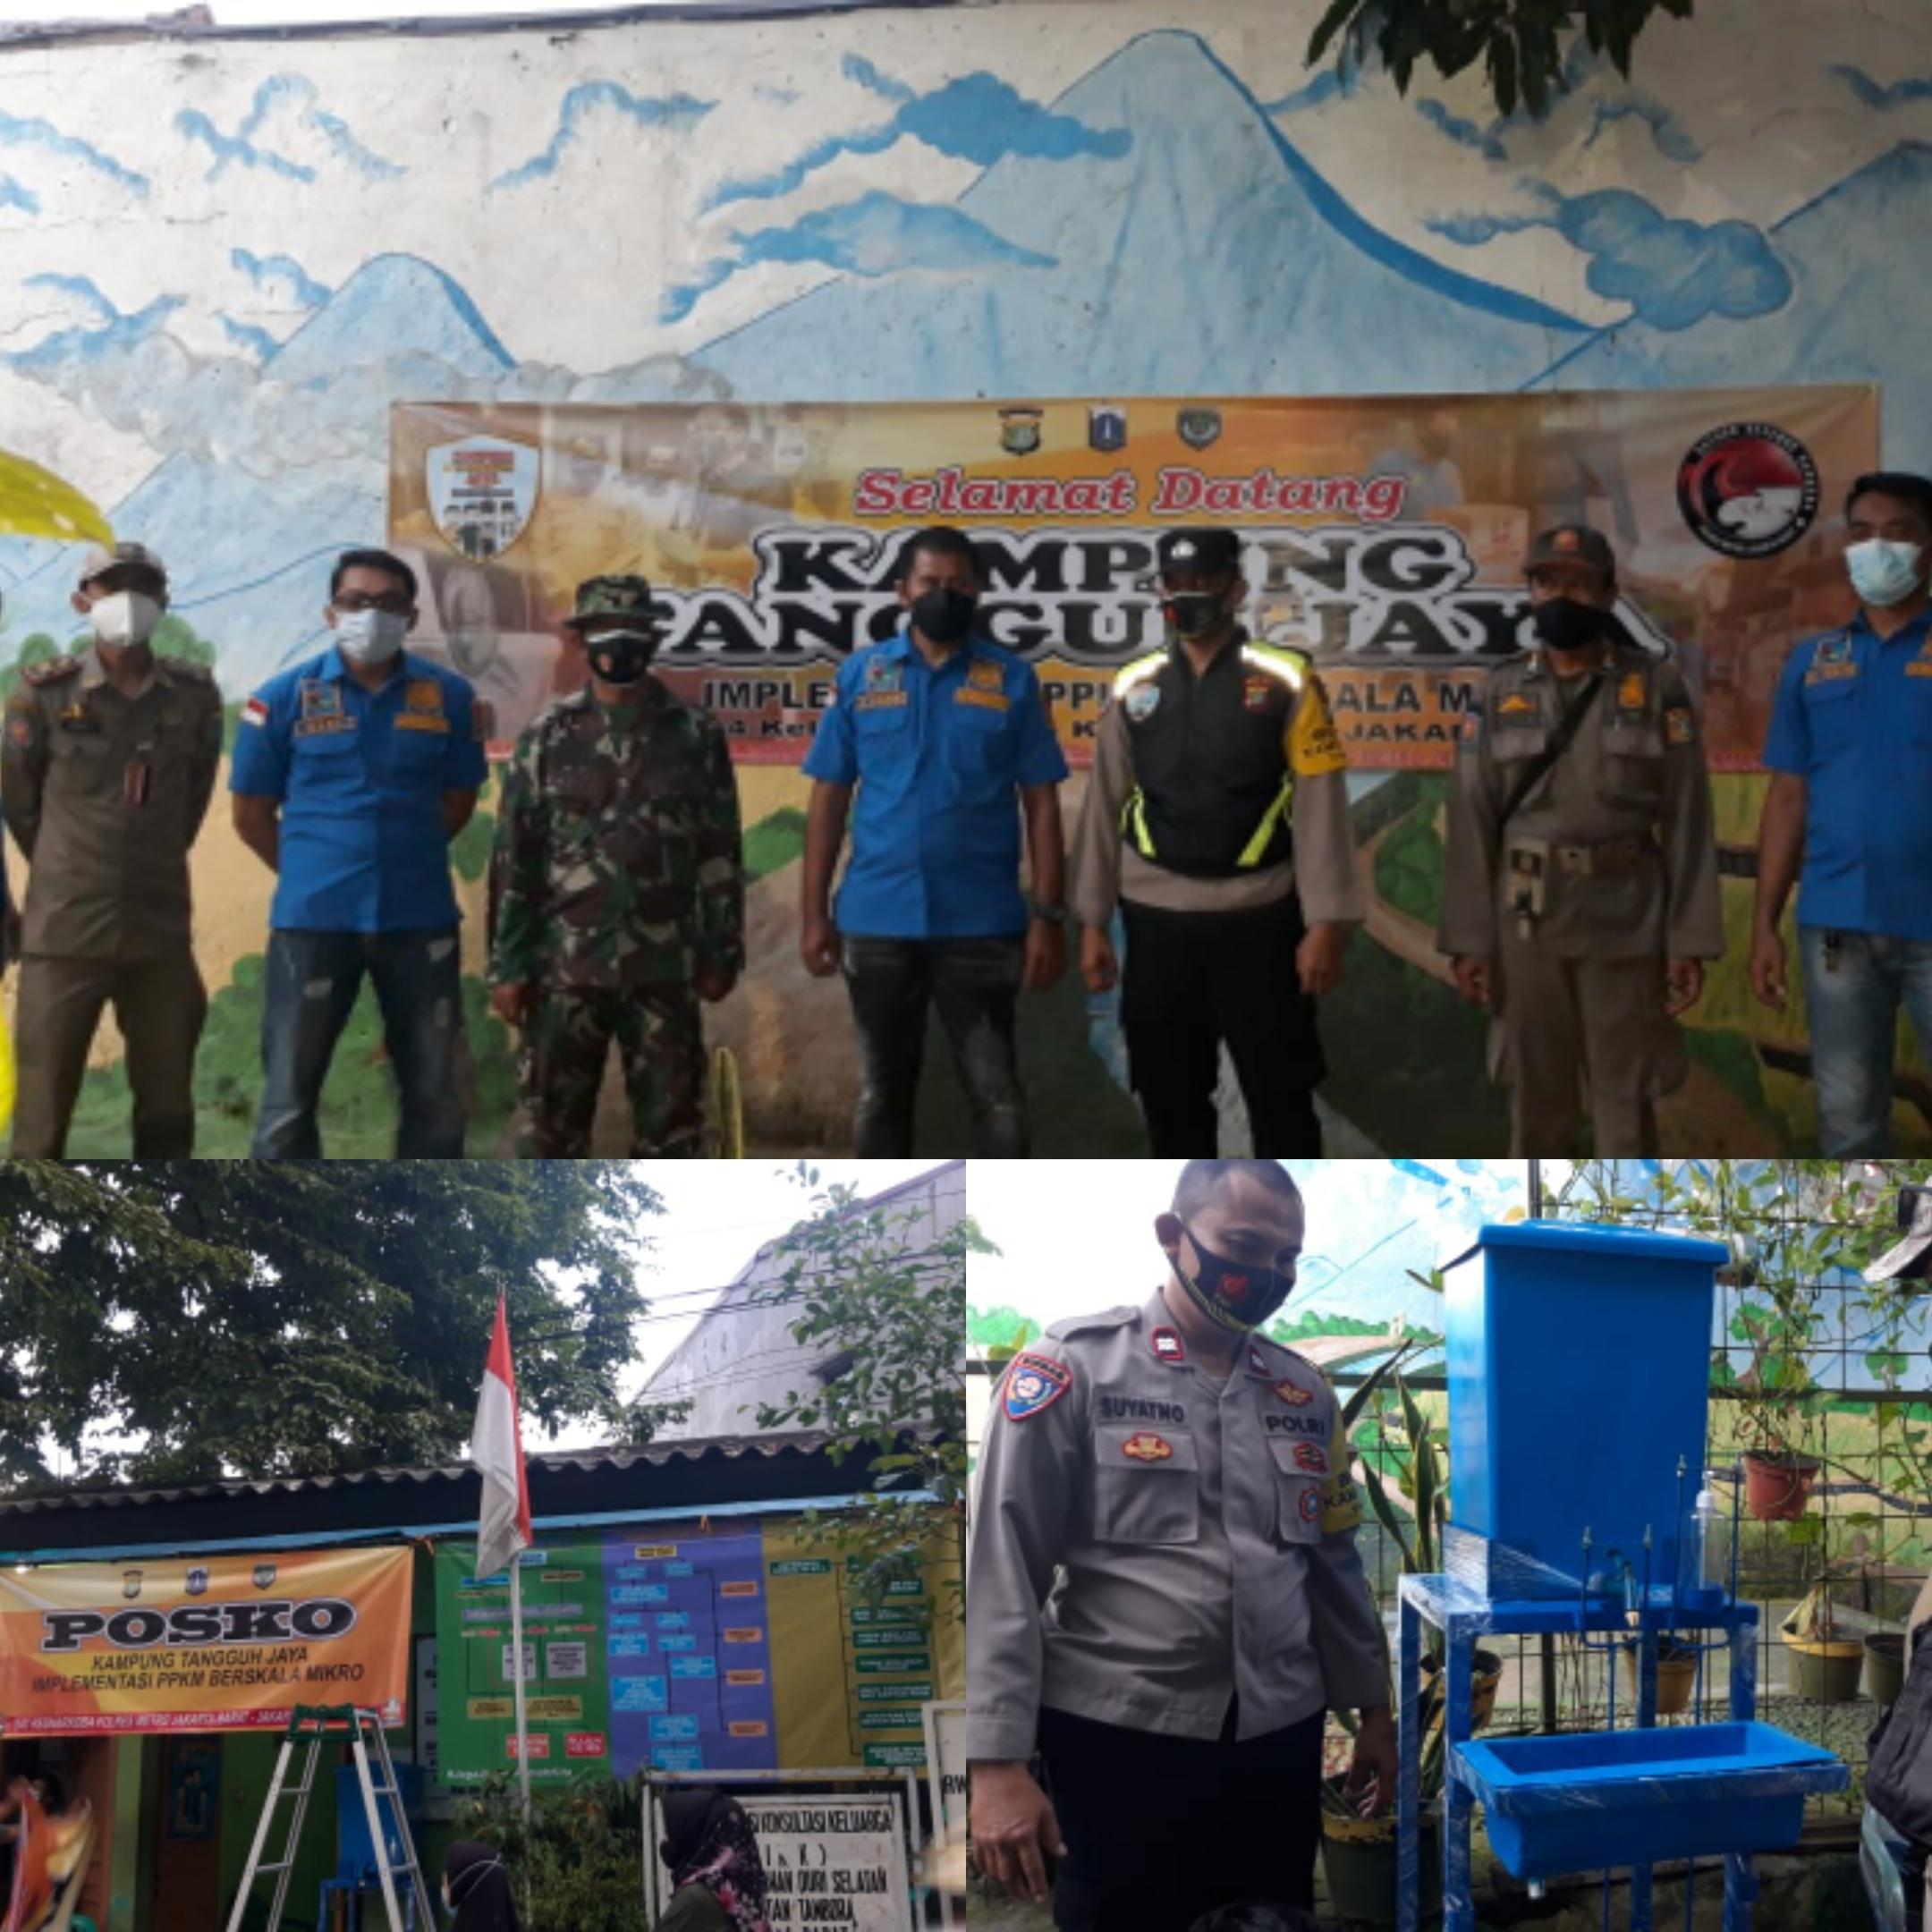 Teamsus 3 Sat Narkoba Polres Jakbar Resmikan Kampung tangguh Jaya di Tambora Jakarta Barat